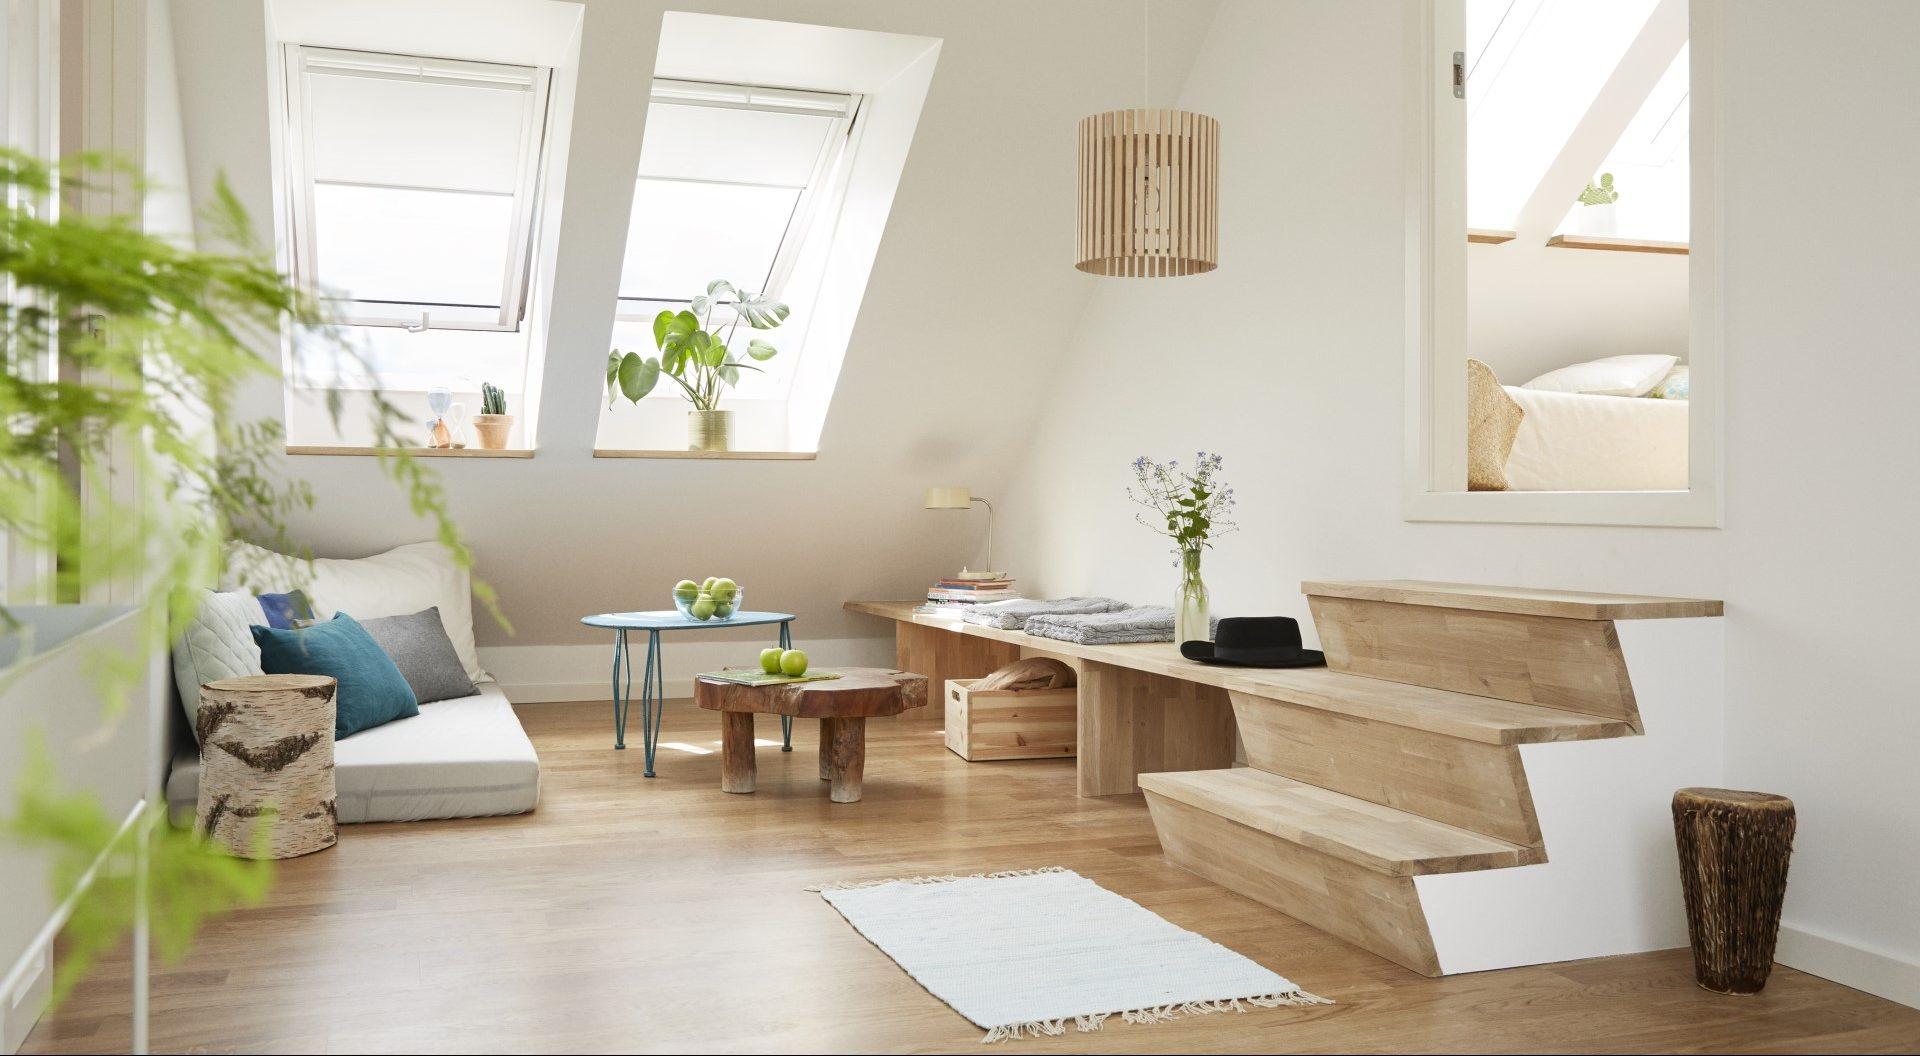 Soffitti Alti Soluzioni : Trucchi indispensabili per i soffitti bassi mansarda